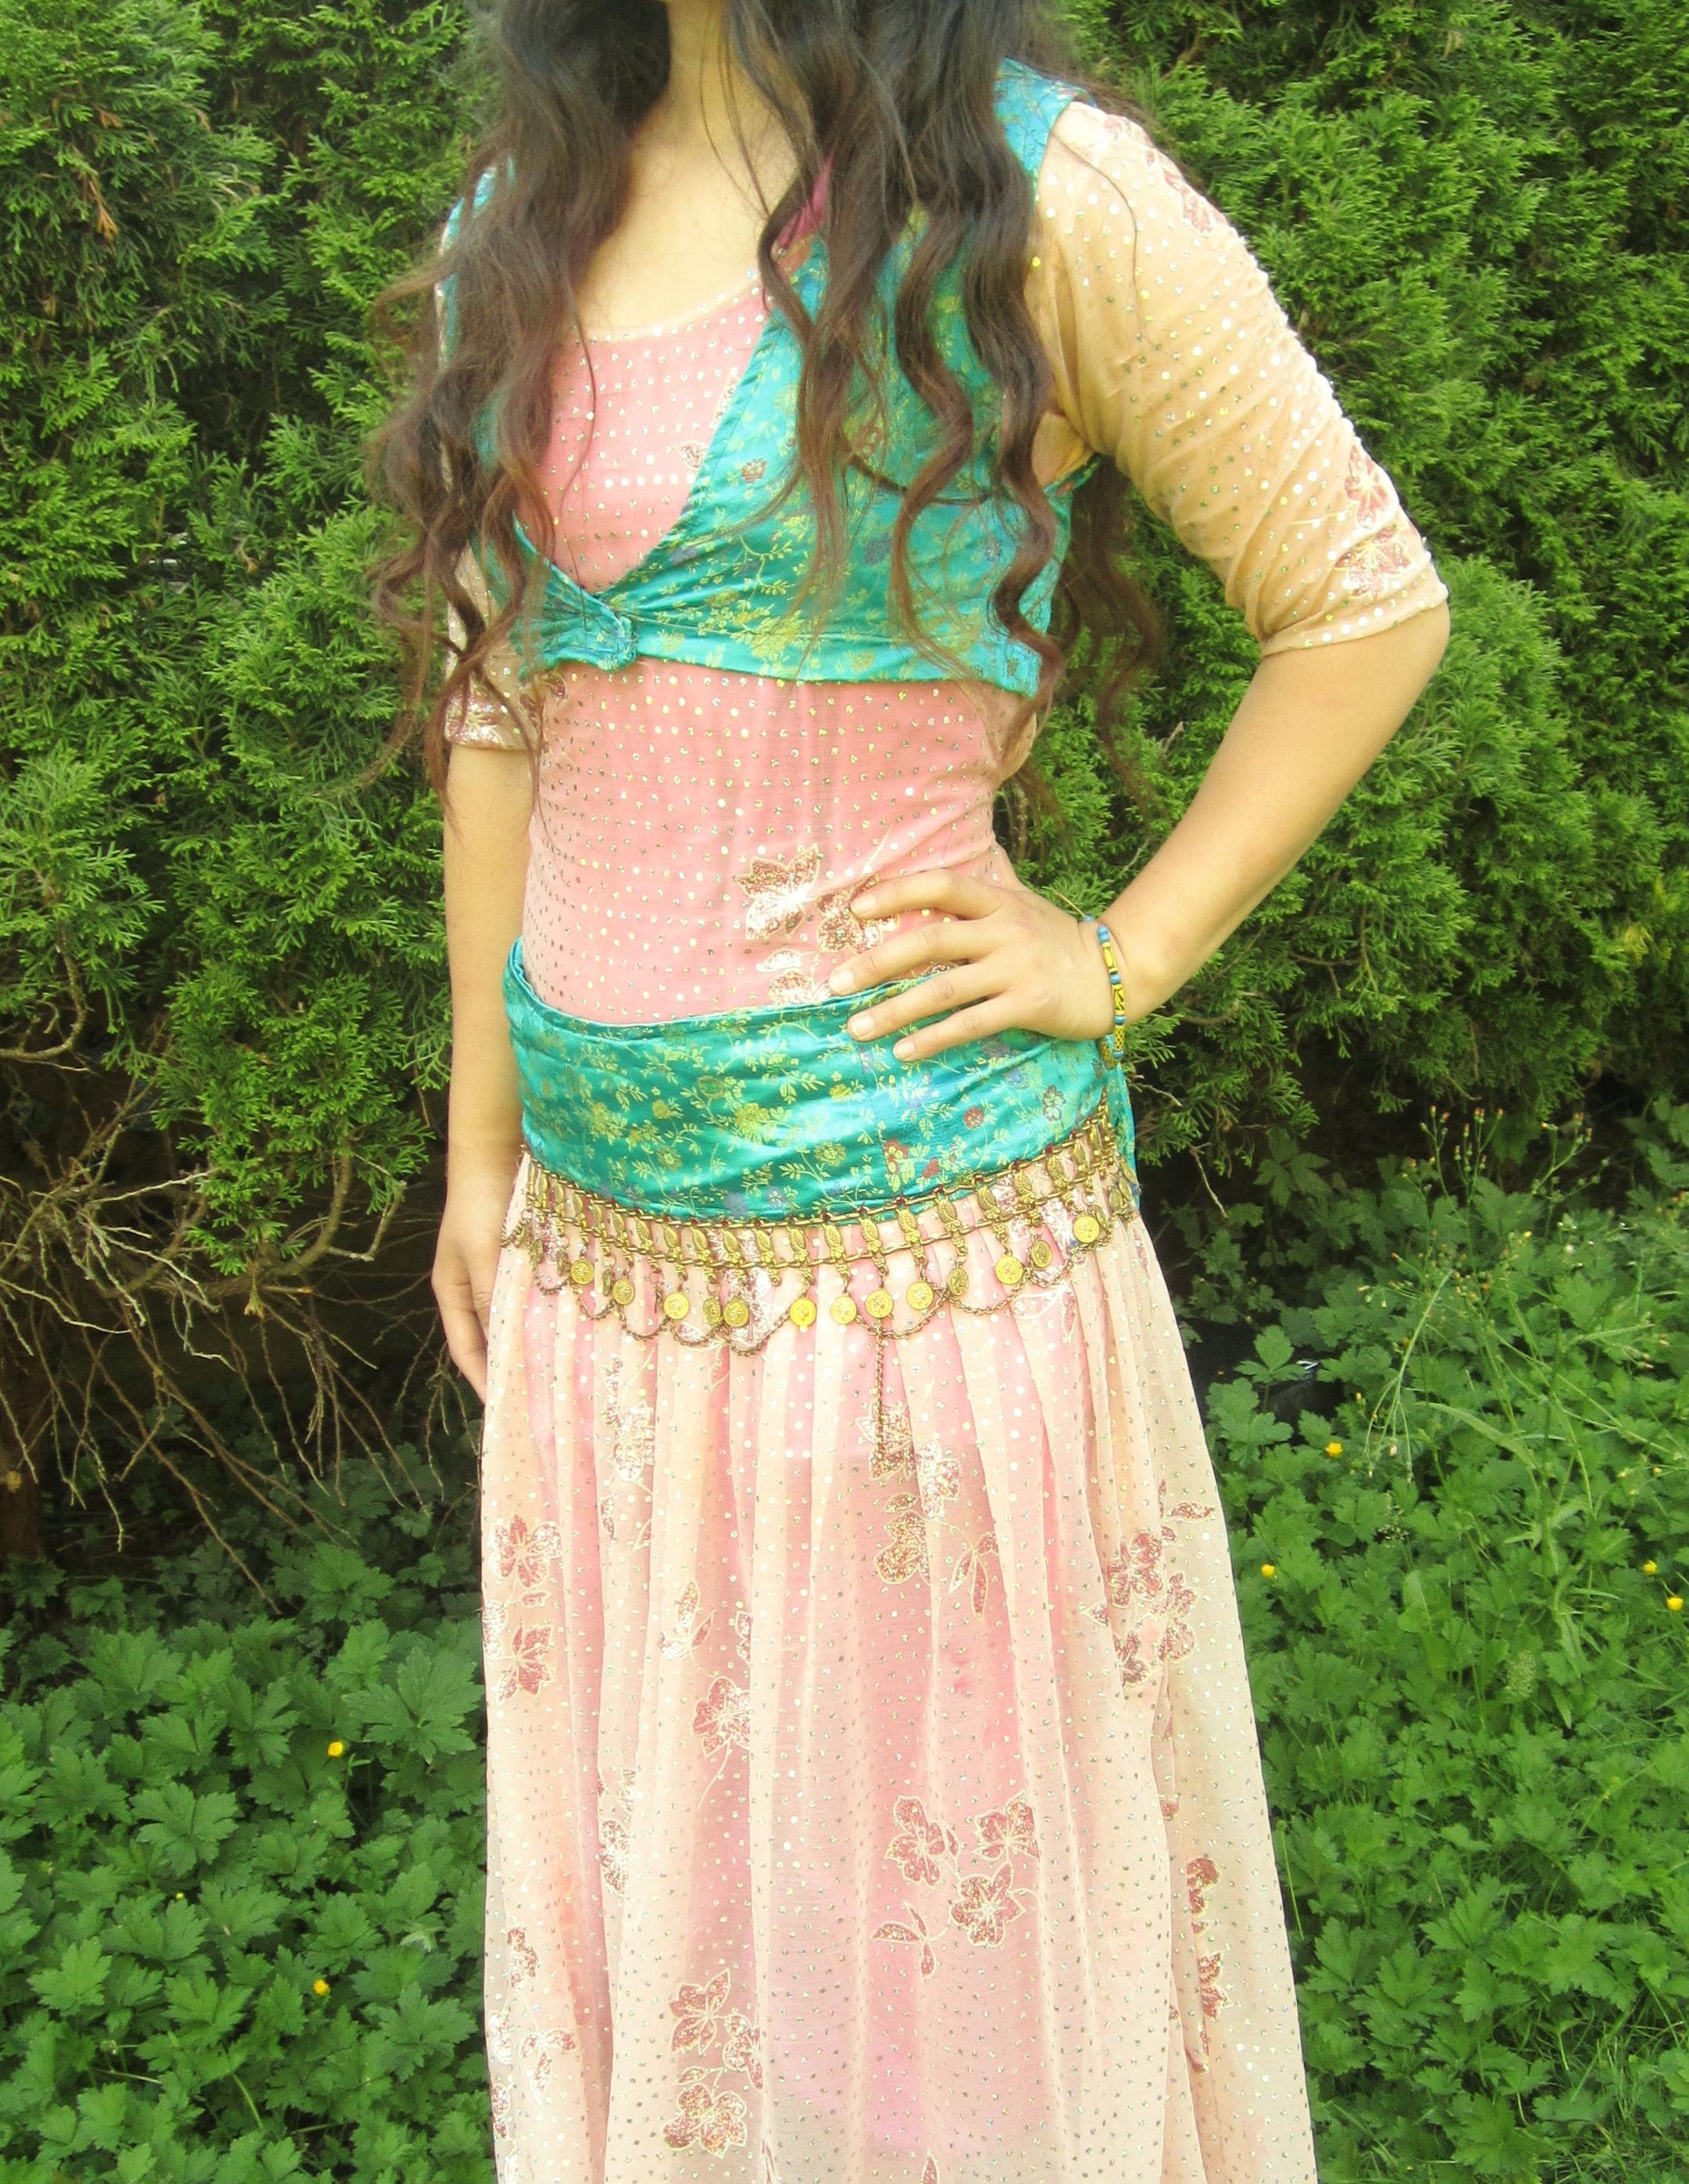 Cool 23 Amazing Kurdish Women Dress U2013 Playzoa.com